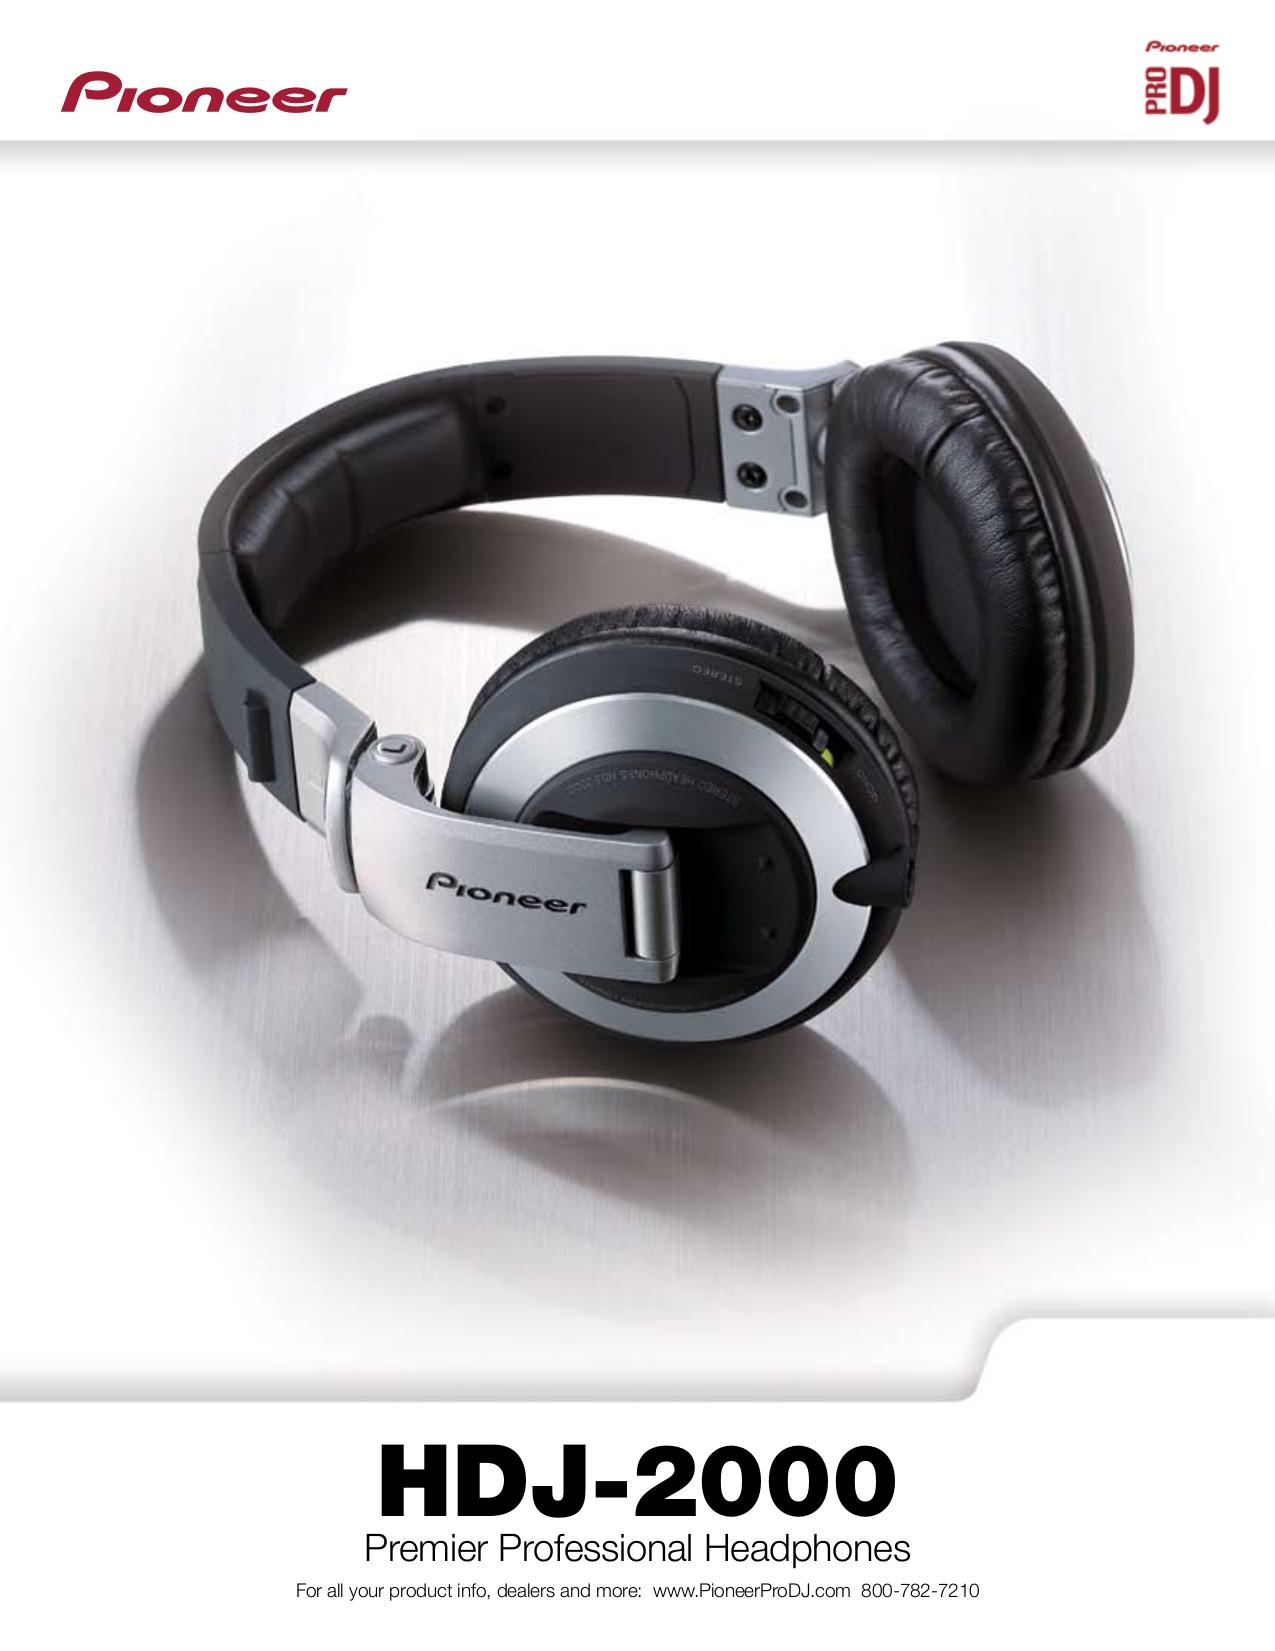 pdf for Pioneer Headphone HDJ-2000 manual